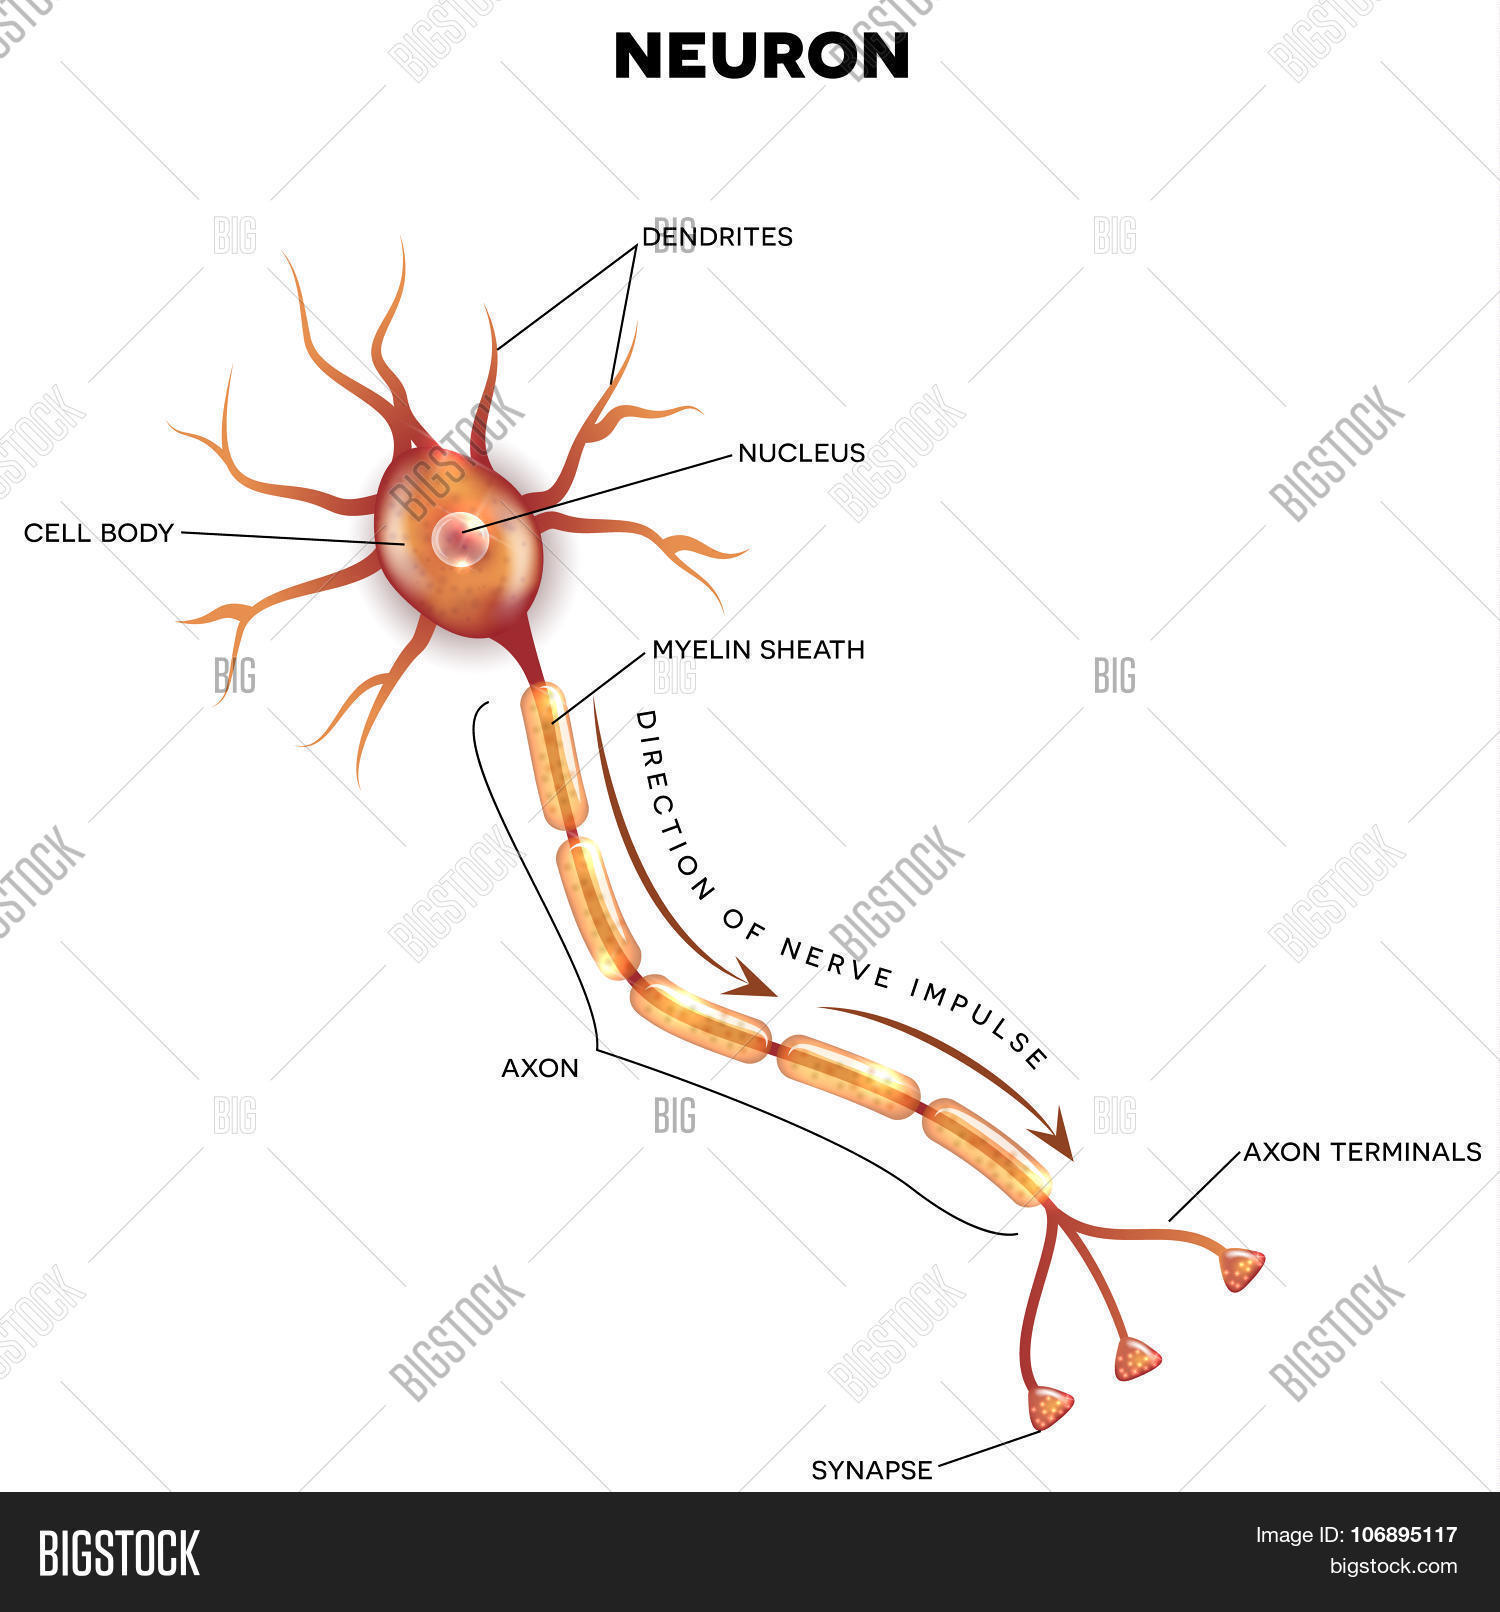 Labeled Diagram Neuron Vector & Photo | Bigstock